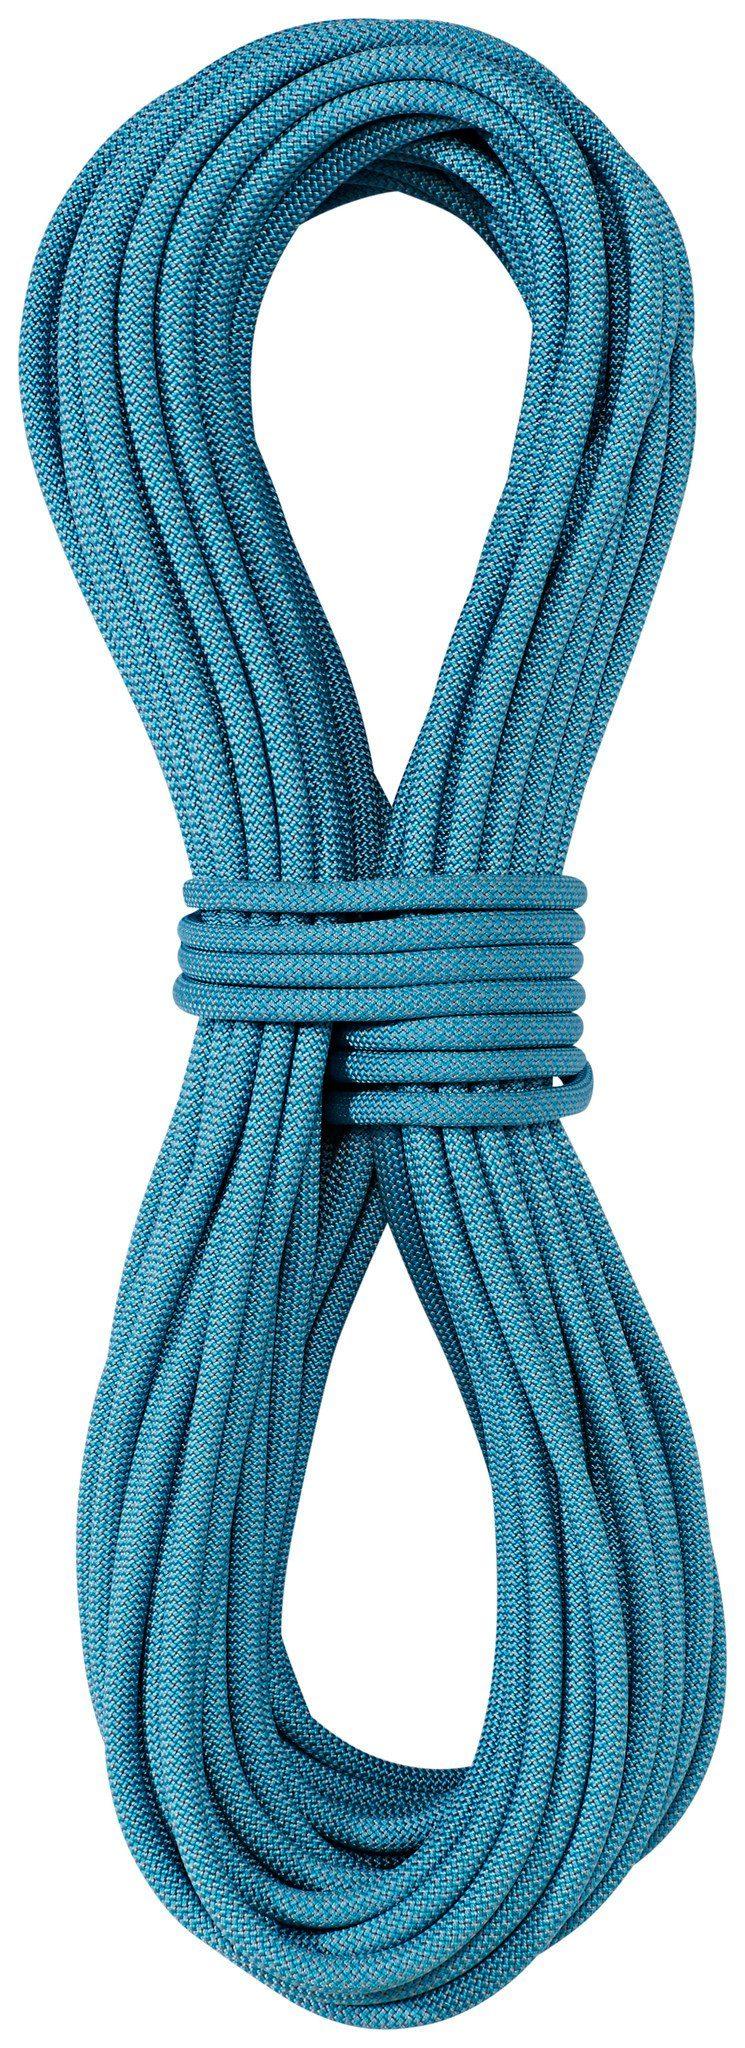 Edelrid Kletterseil »Skimmer Pro Dry Rope 7,1mm 30m«